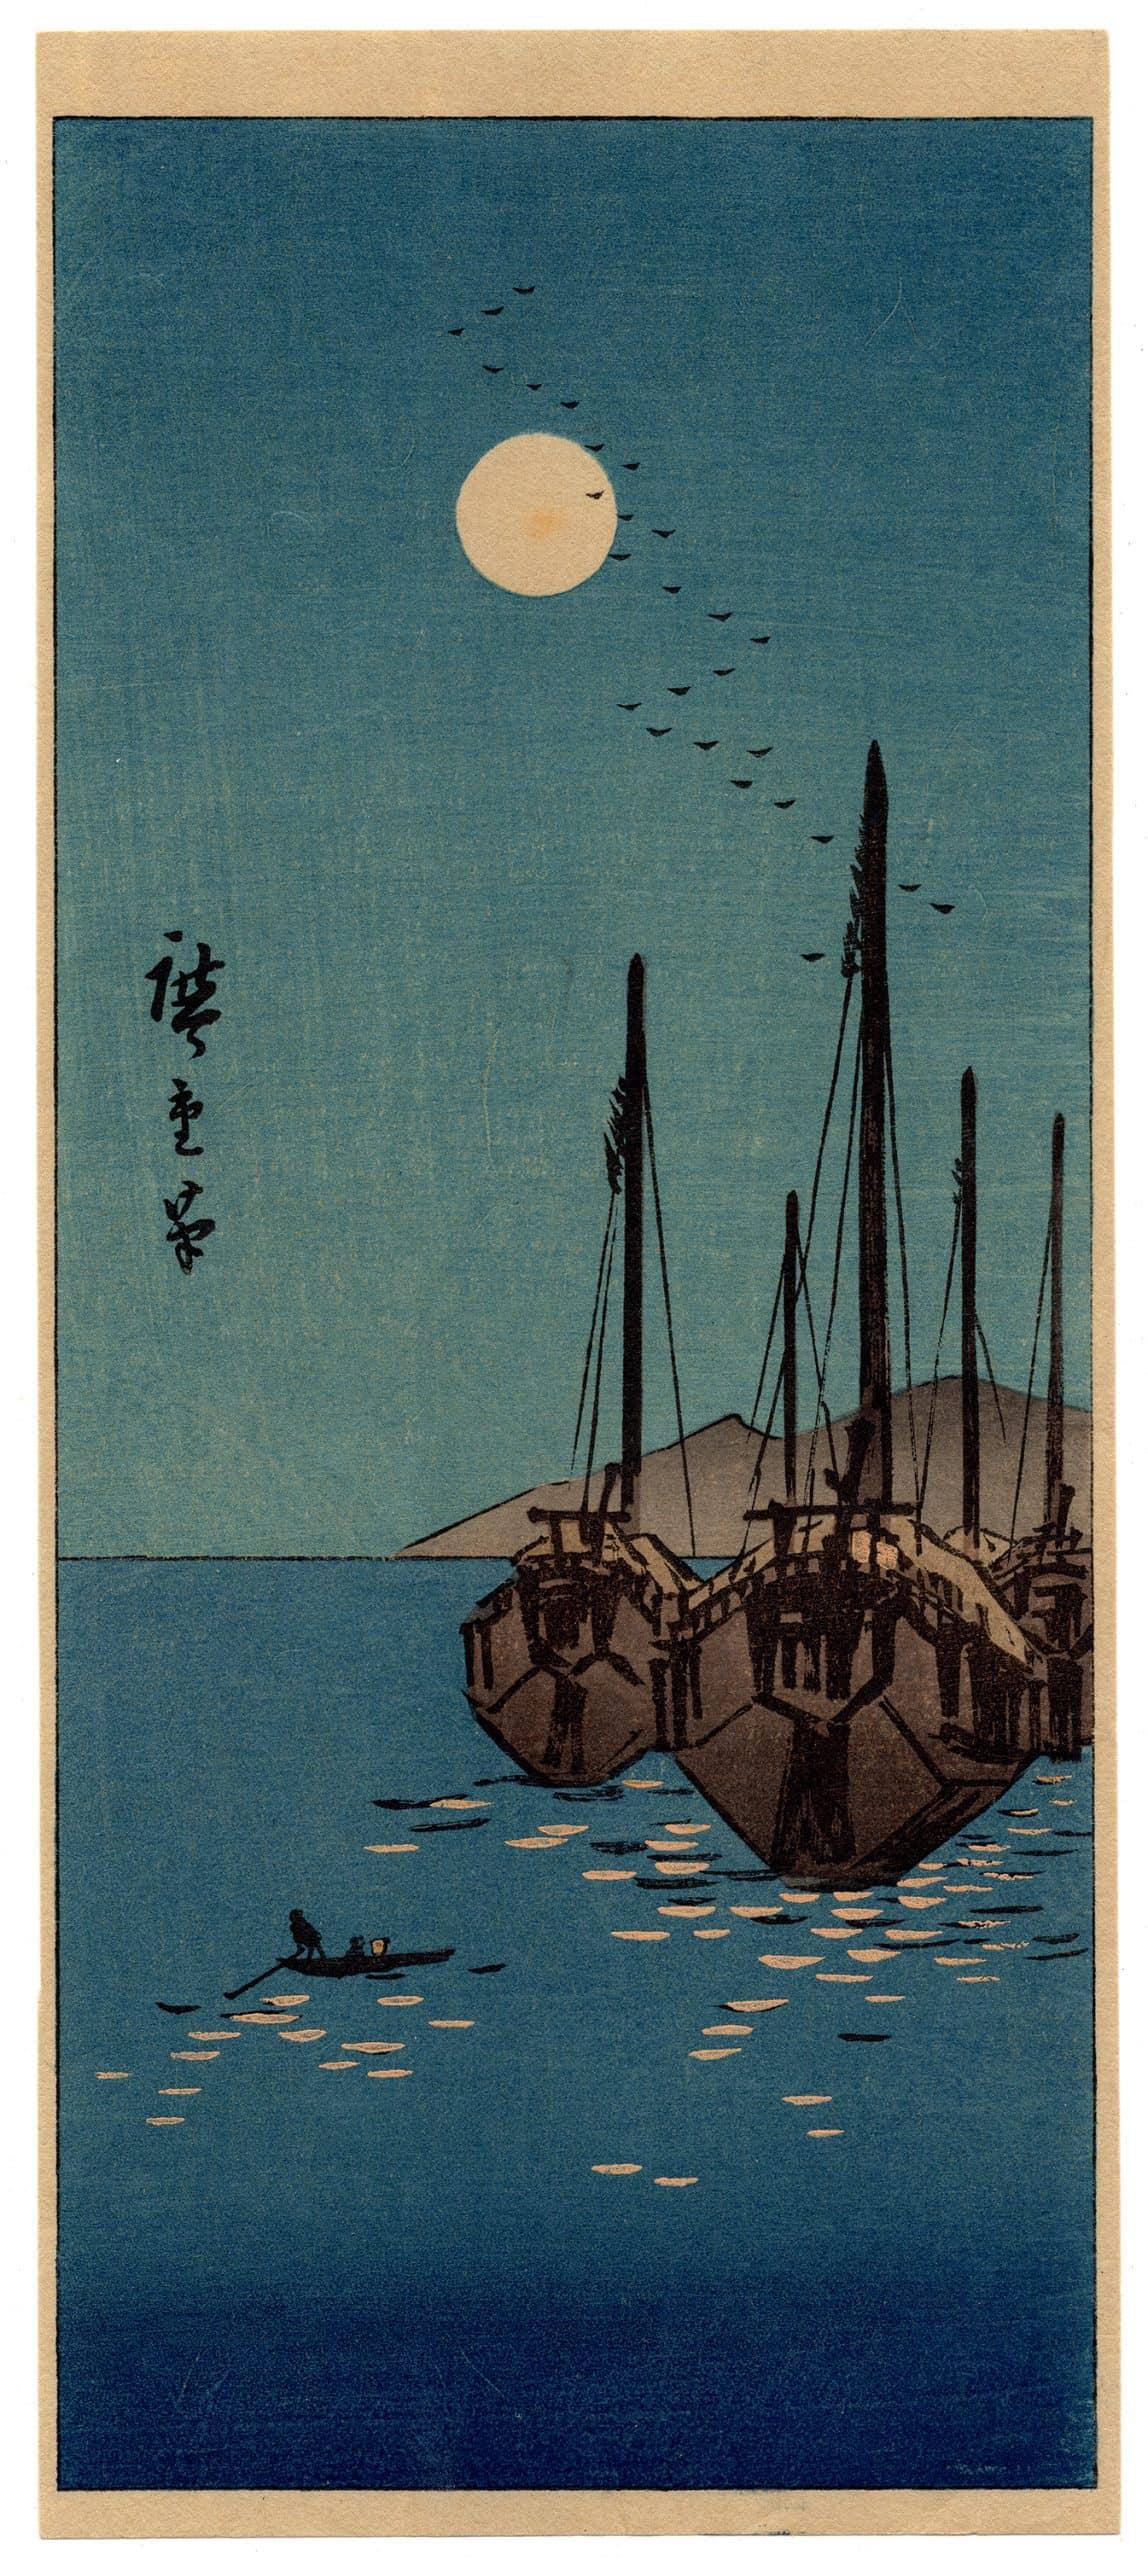 Utagawa Hiroshige - Boats in Moonlight